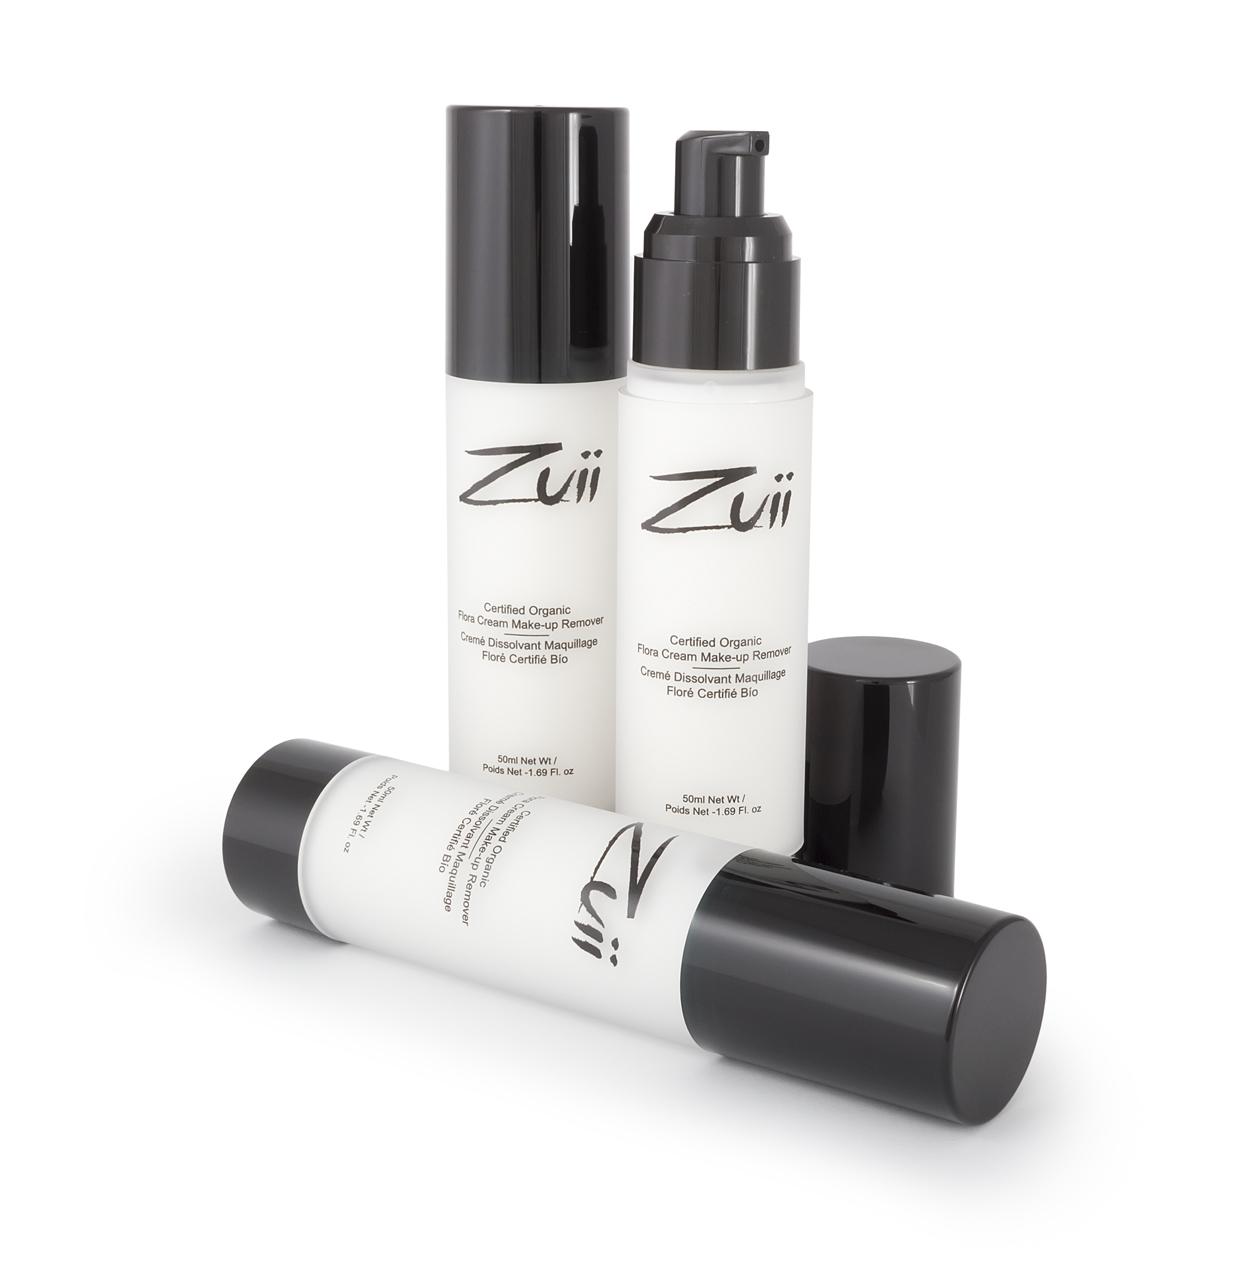 Zuii Organic Makeup Remover